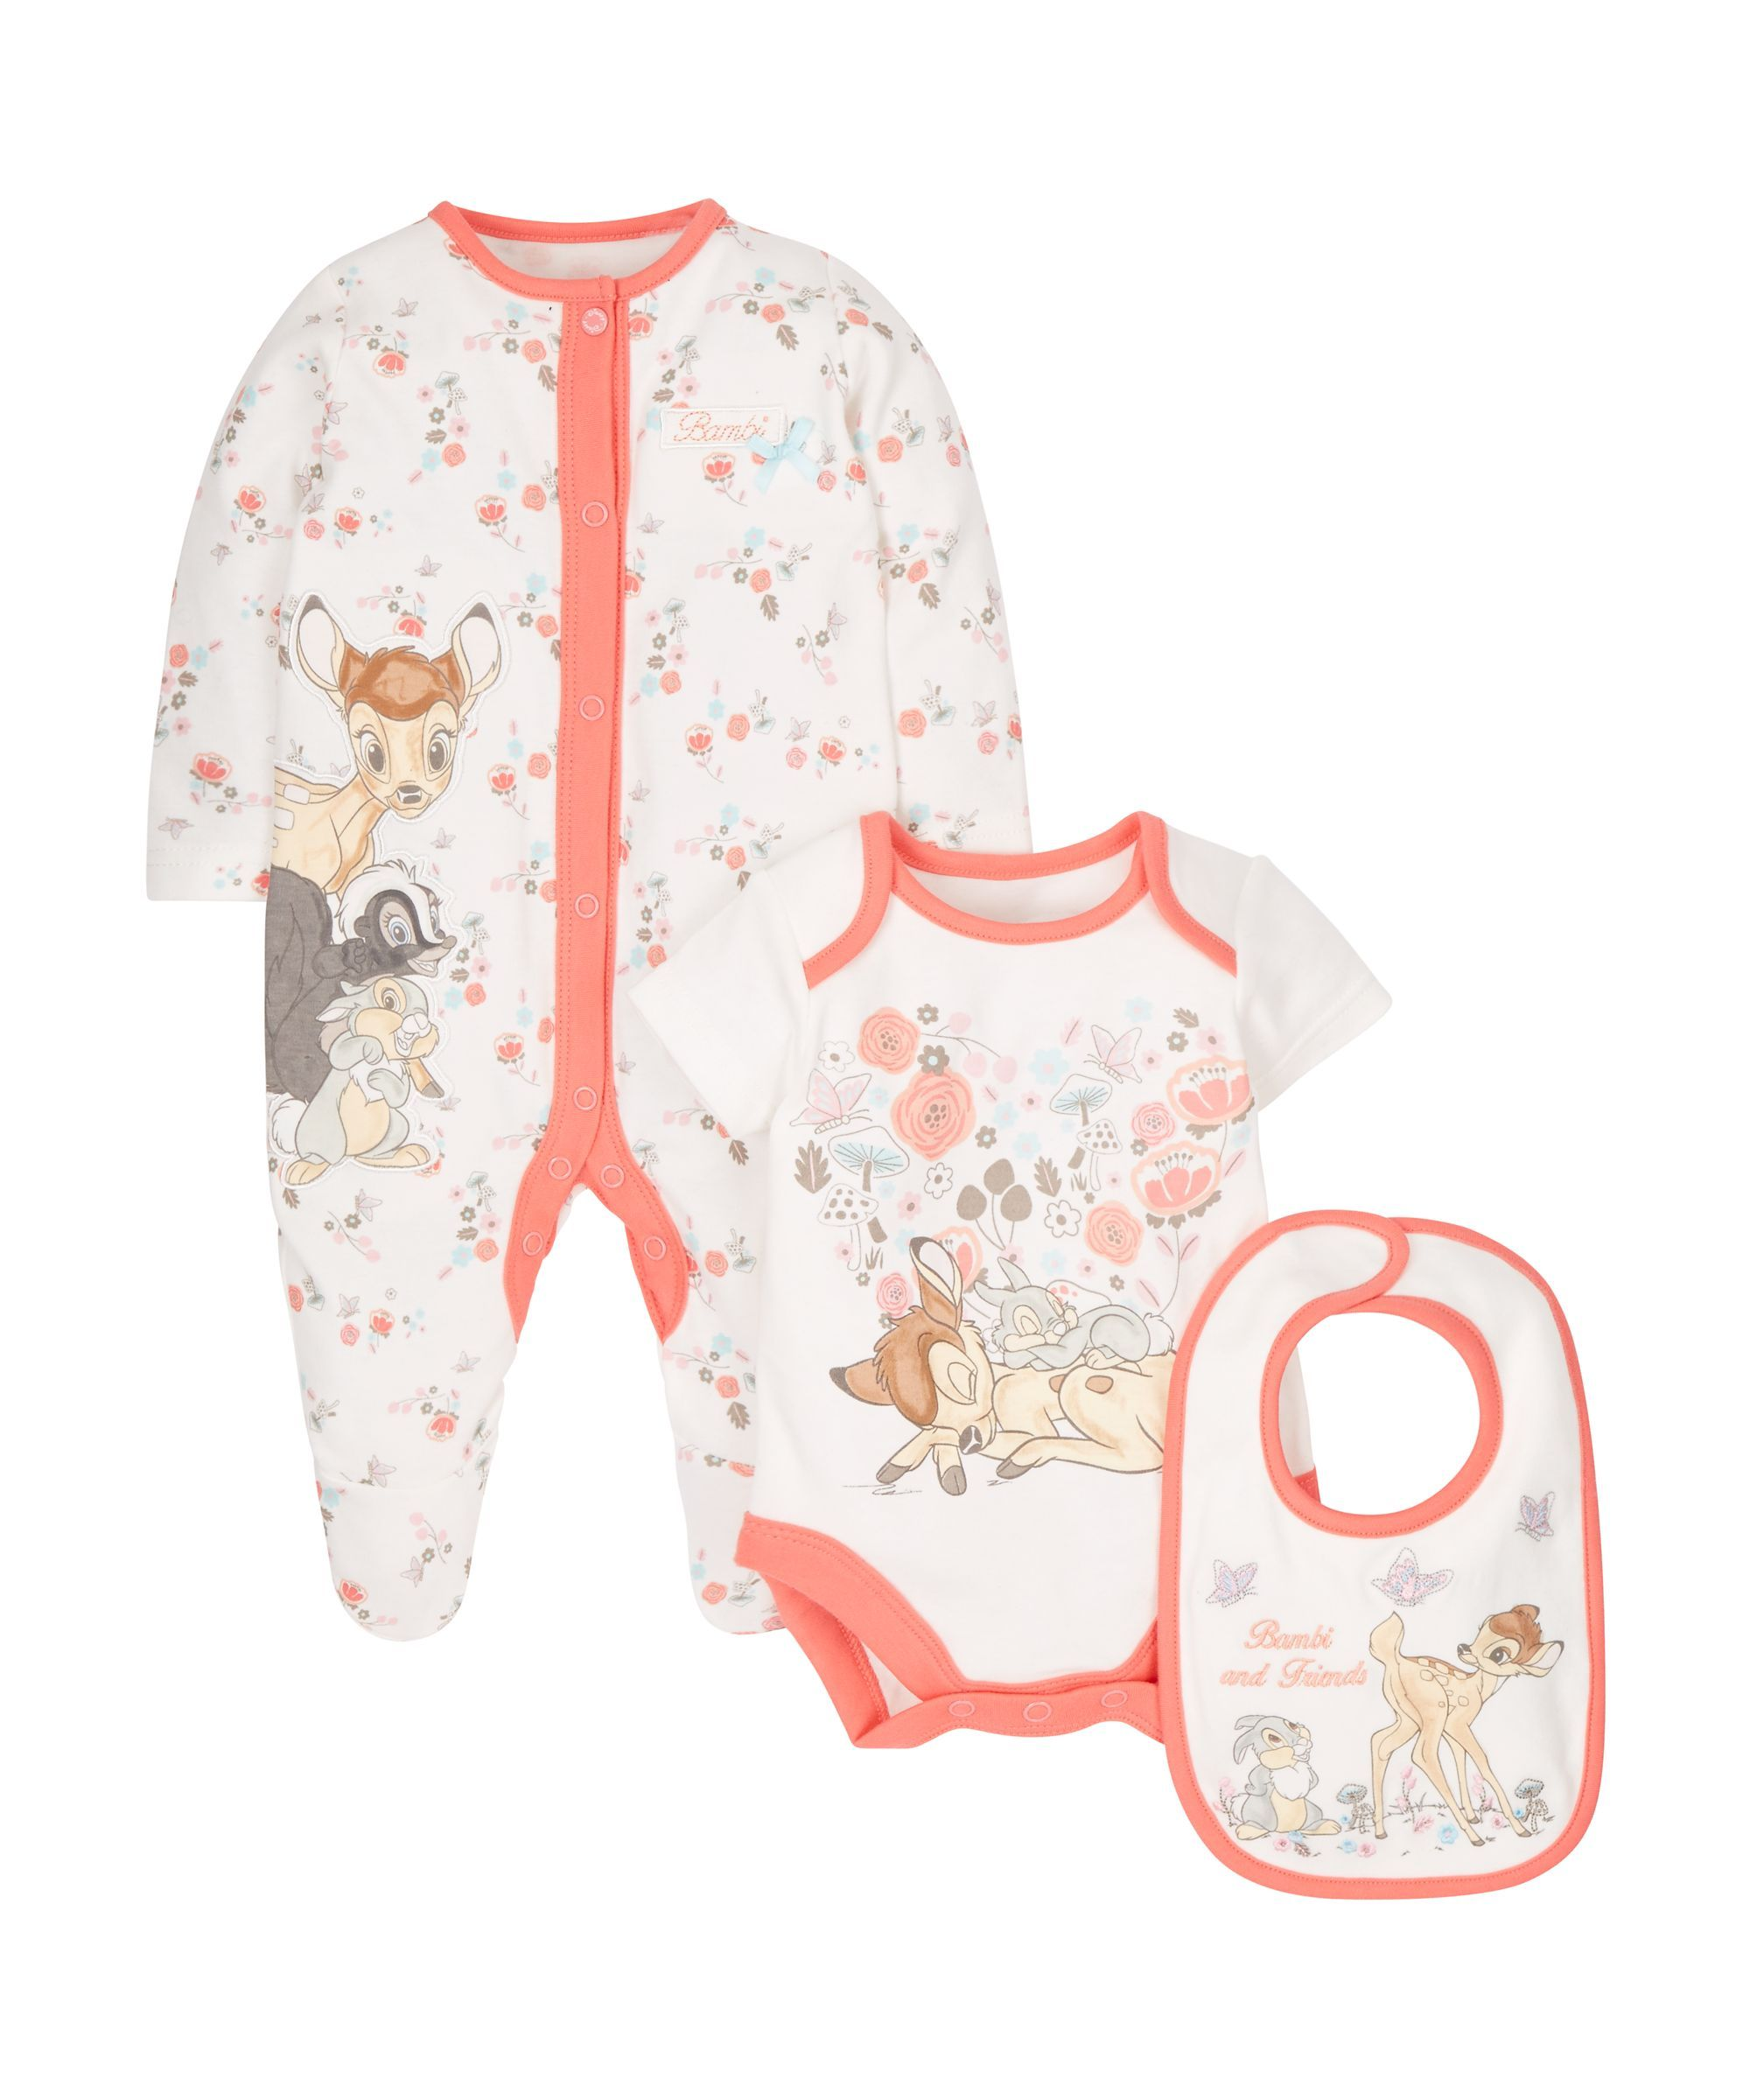 Baby-Overall in Beige und Rosa Bambi Disney